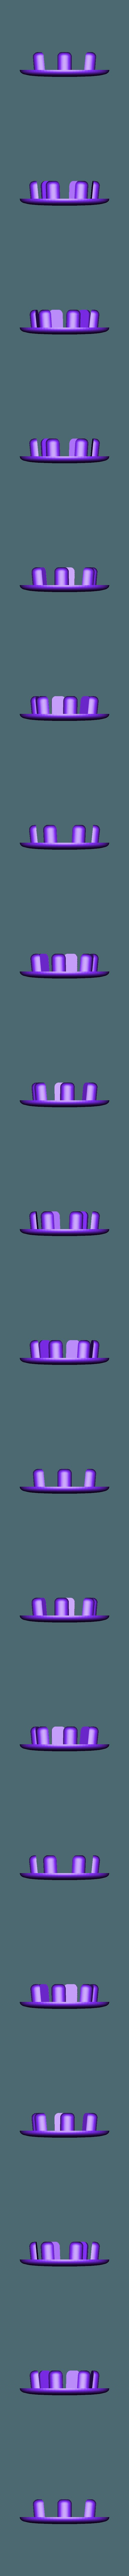 Assemblage1 williams.STL Download free STL file credit insert on pinball machine Zaccaria, Williams • 3D printable design, alex20117